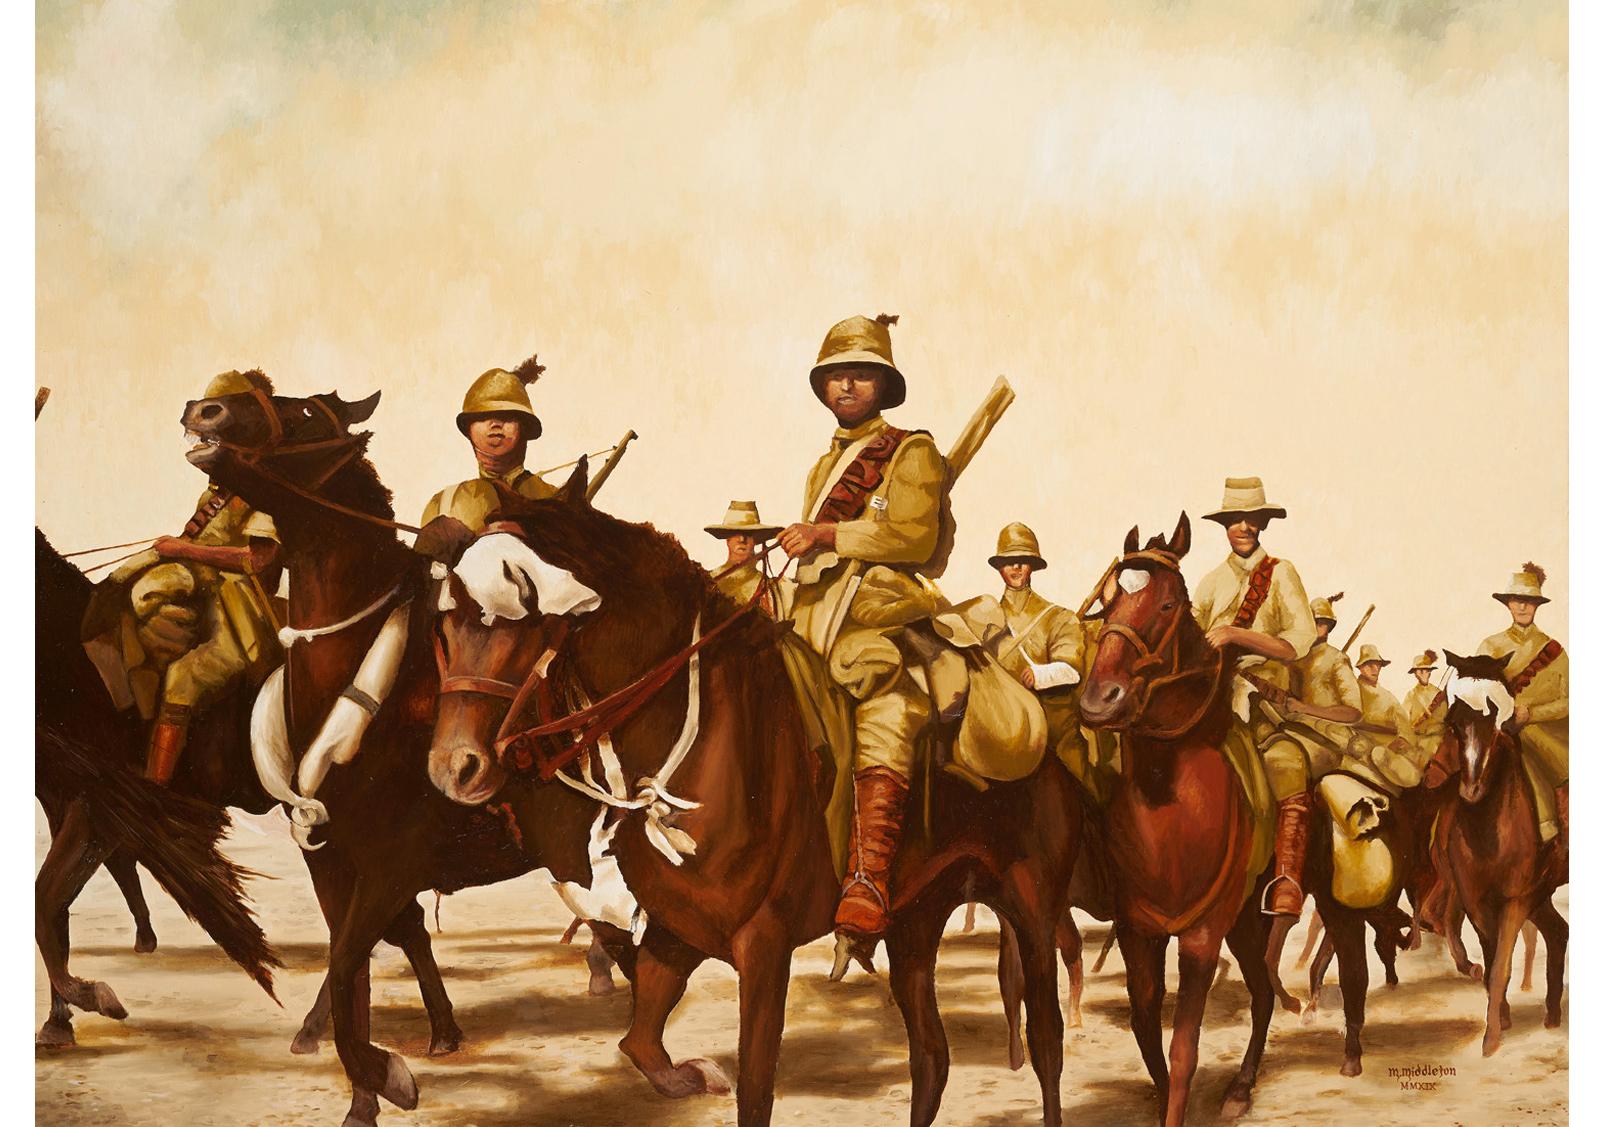 GallipoliArtprize_Finalist_Mark_Middleton